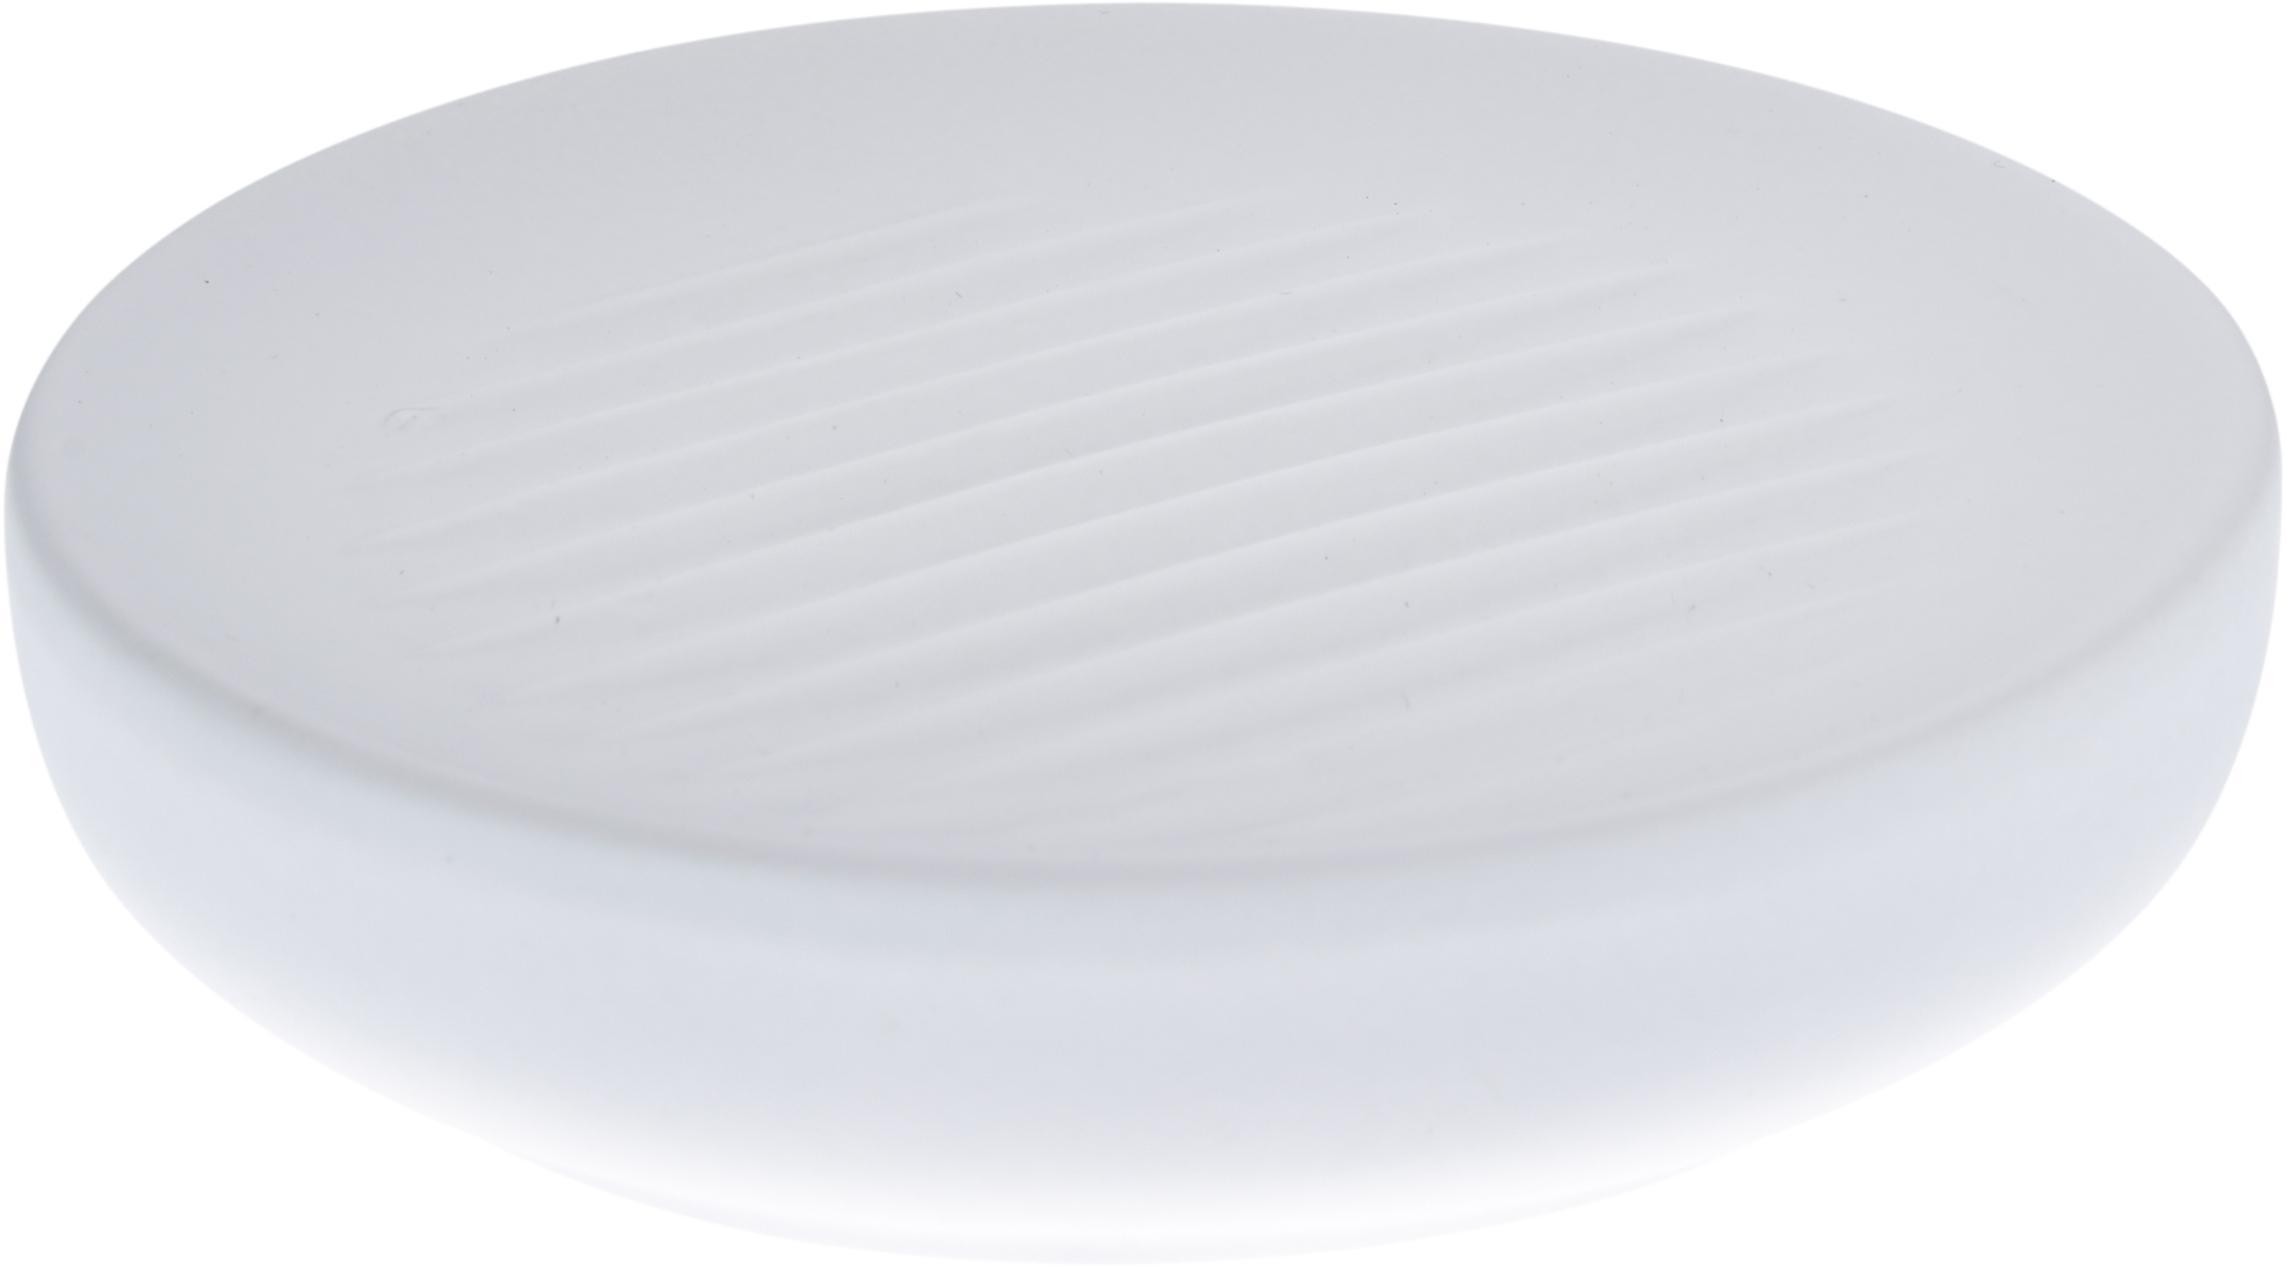 Jabonera Ume, Porcelana, Blanco, Ø 12 x Al 3 cm